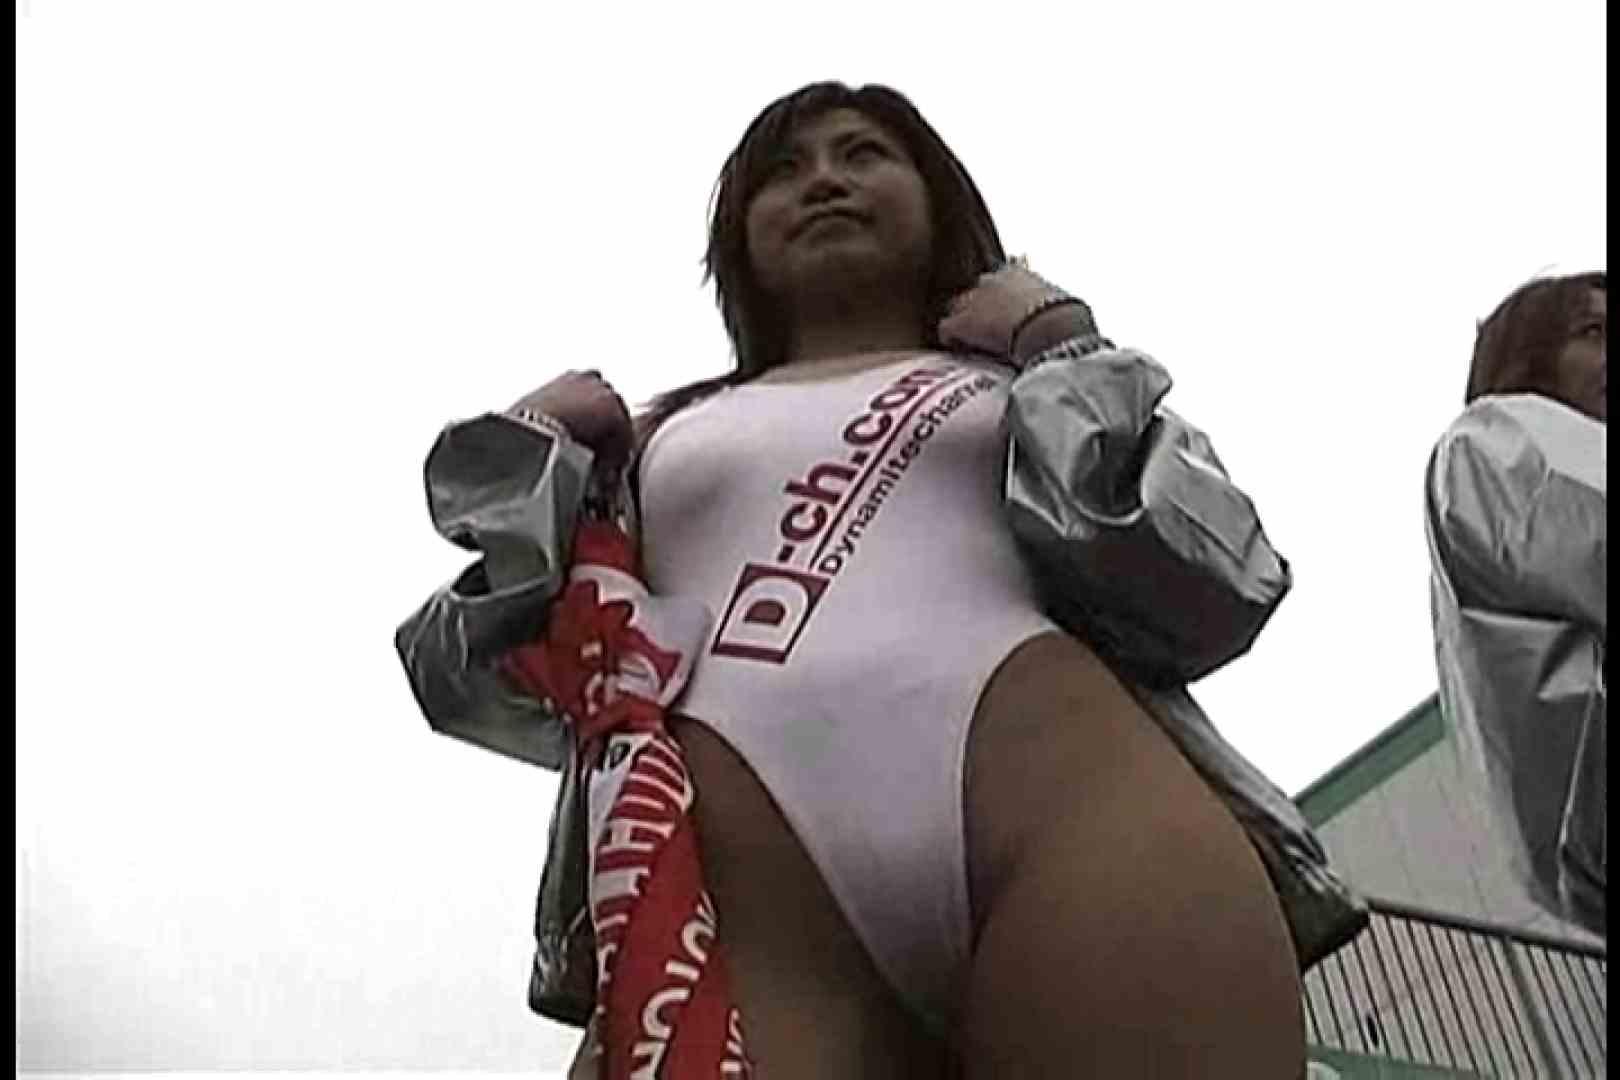 RQカメラ地獄Vol.3 美女OL   レースクイーン  83連発 41